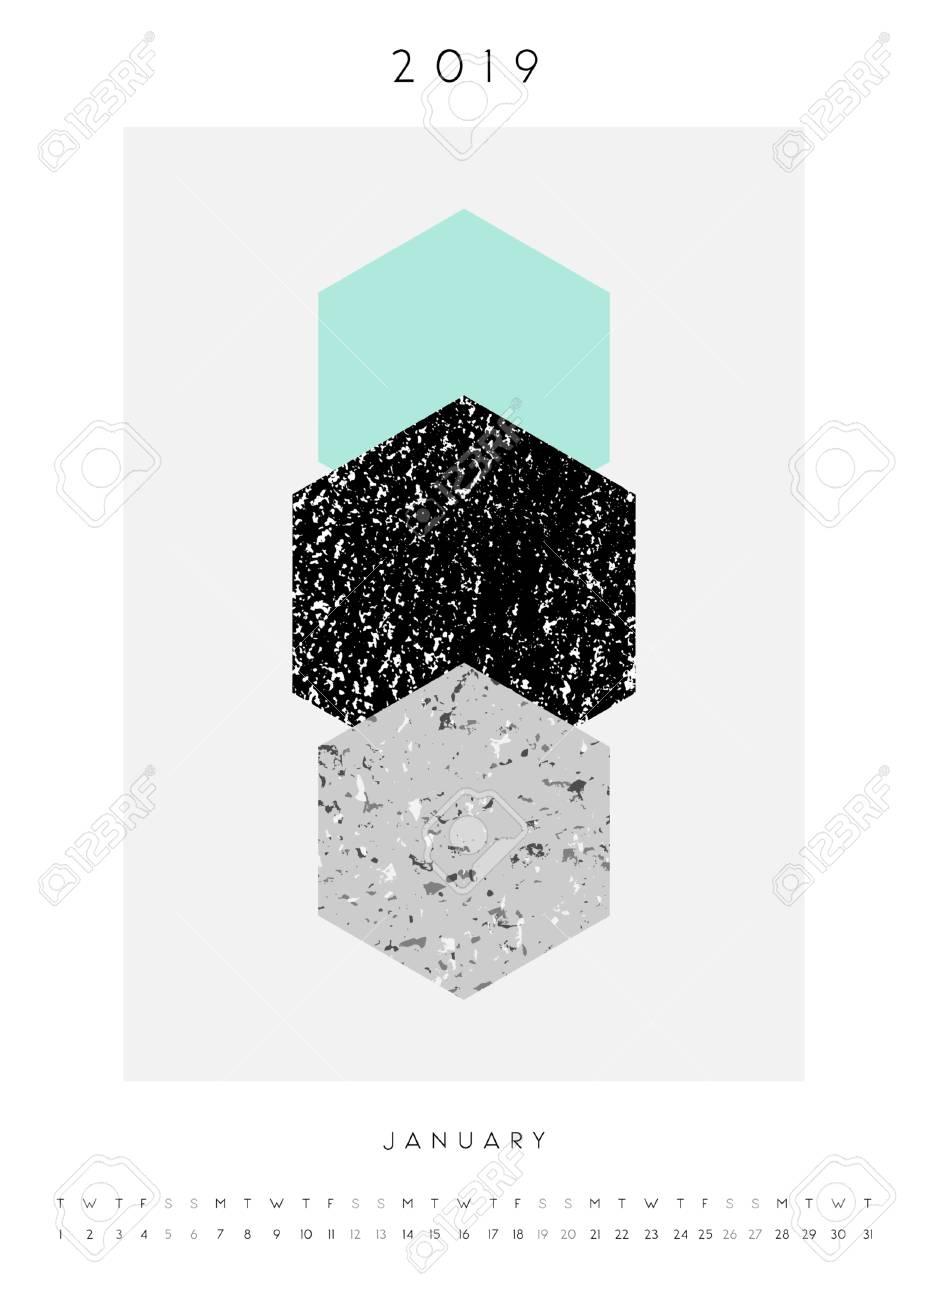 Printable A4 Size January 2019 Calendar Template Abstract